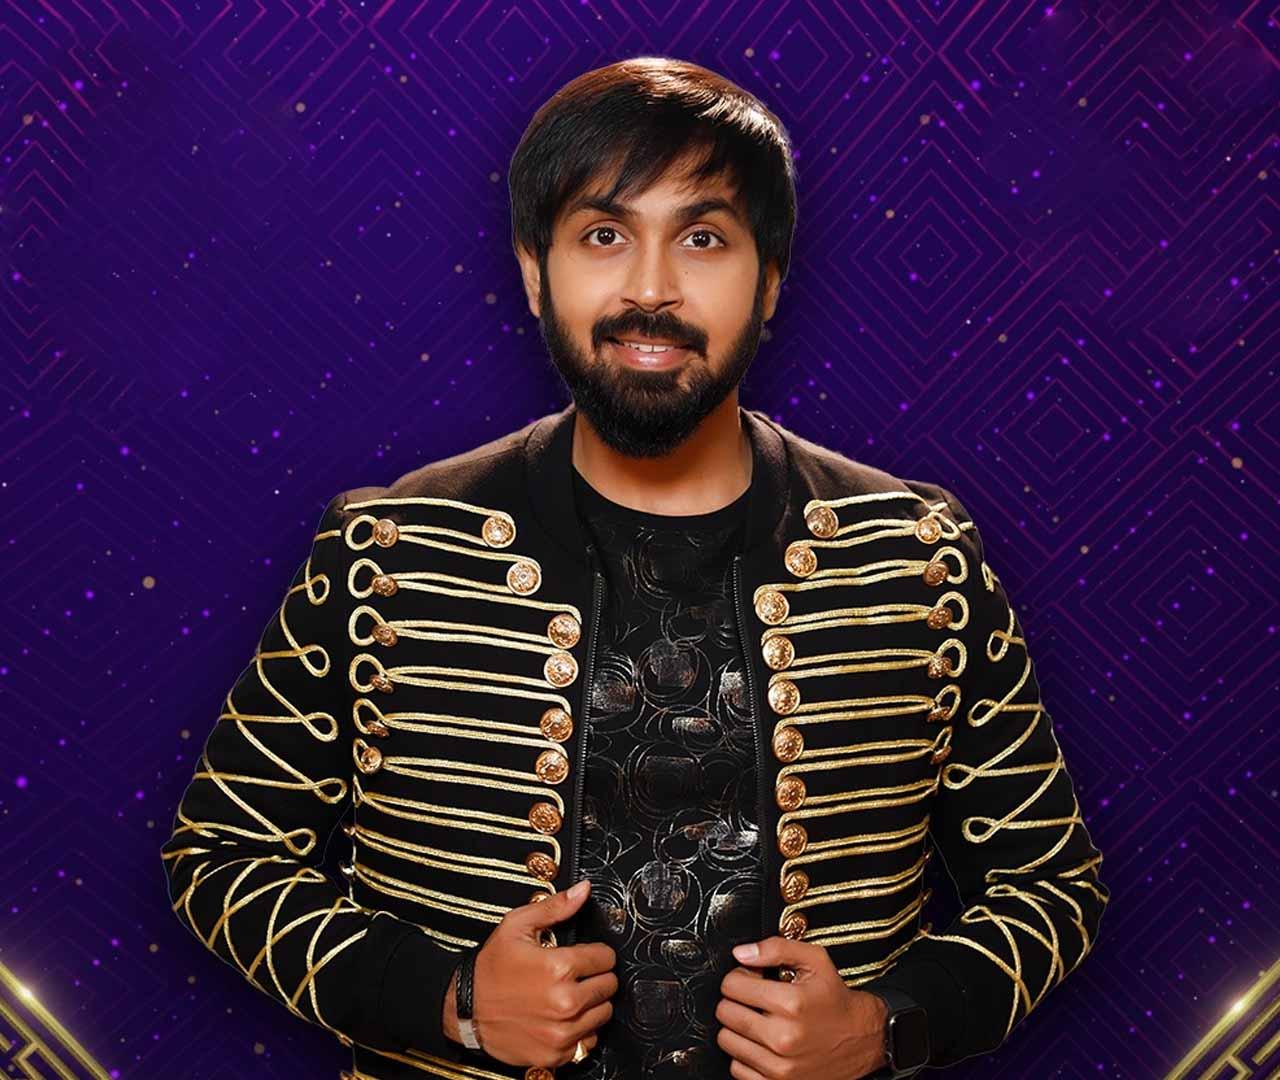 Bigg Boss 5 Telugu 16th contestant Maanas